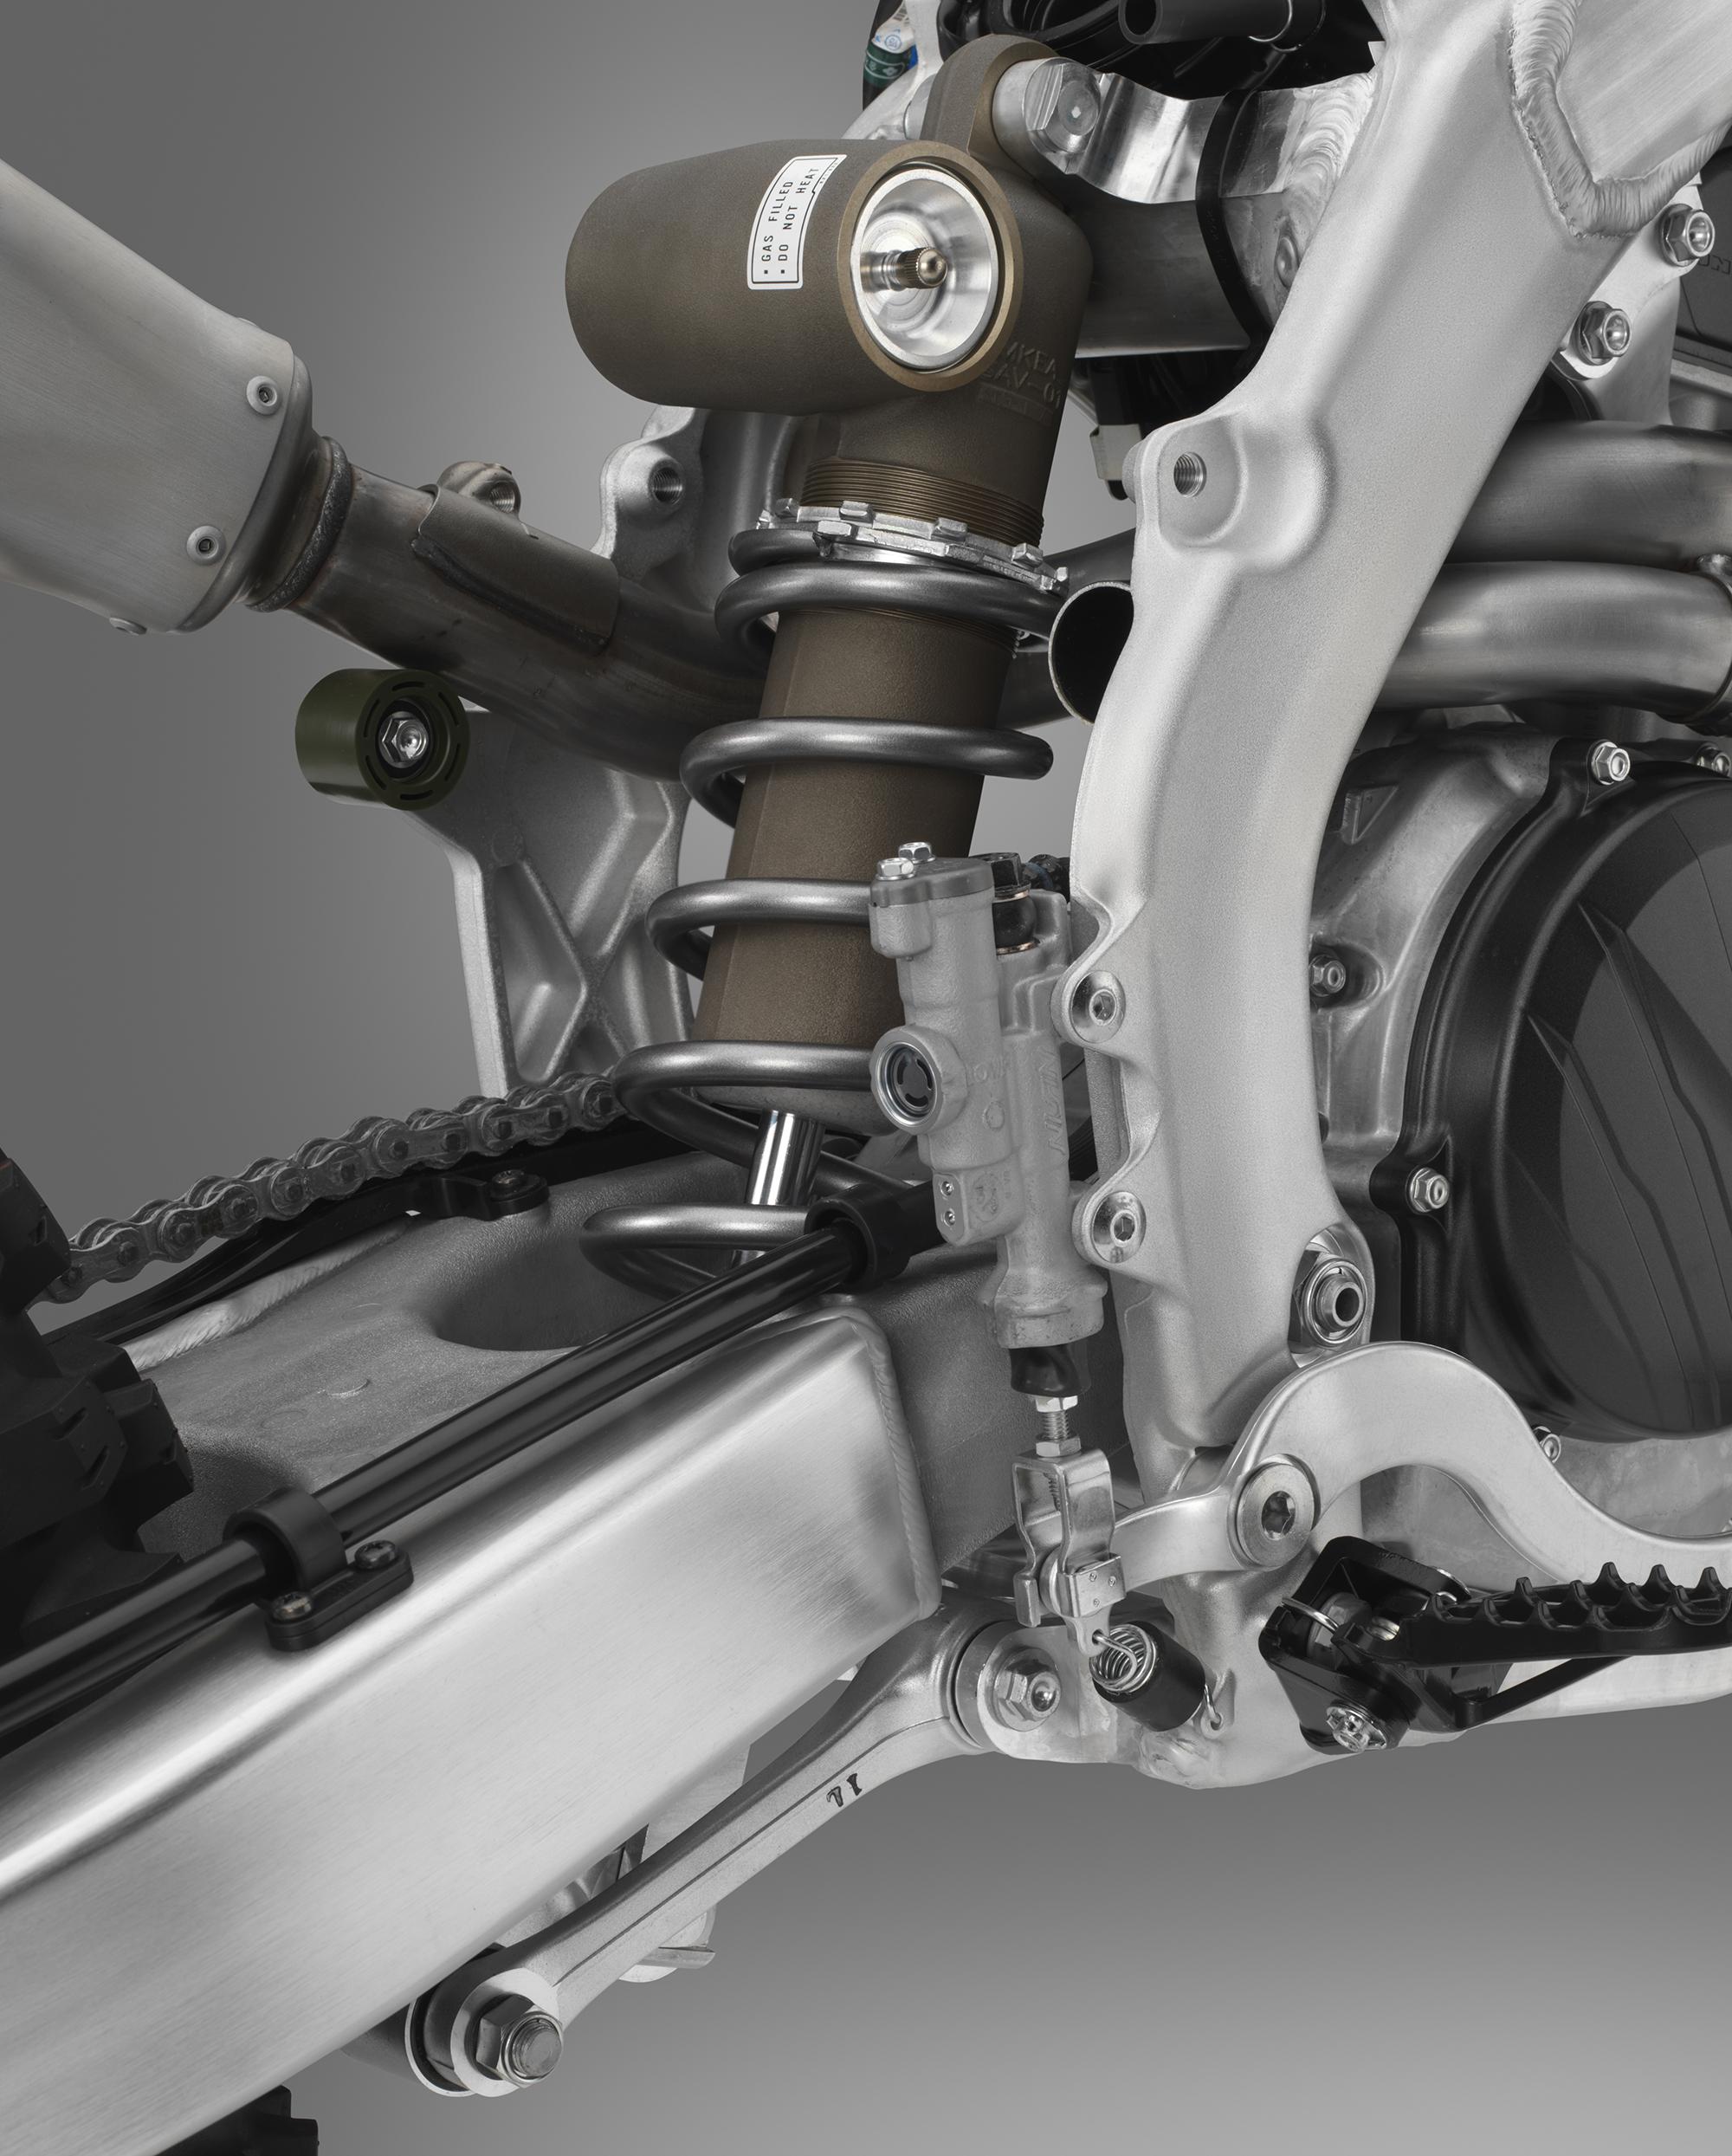 19 Honda CRF450RX_shock.jpg